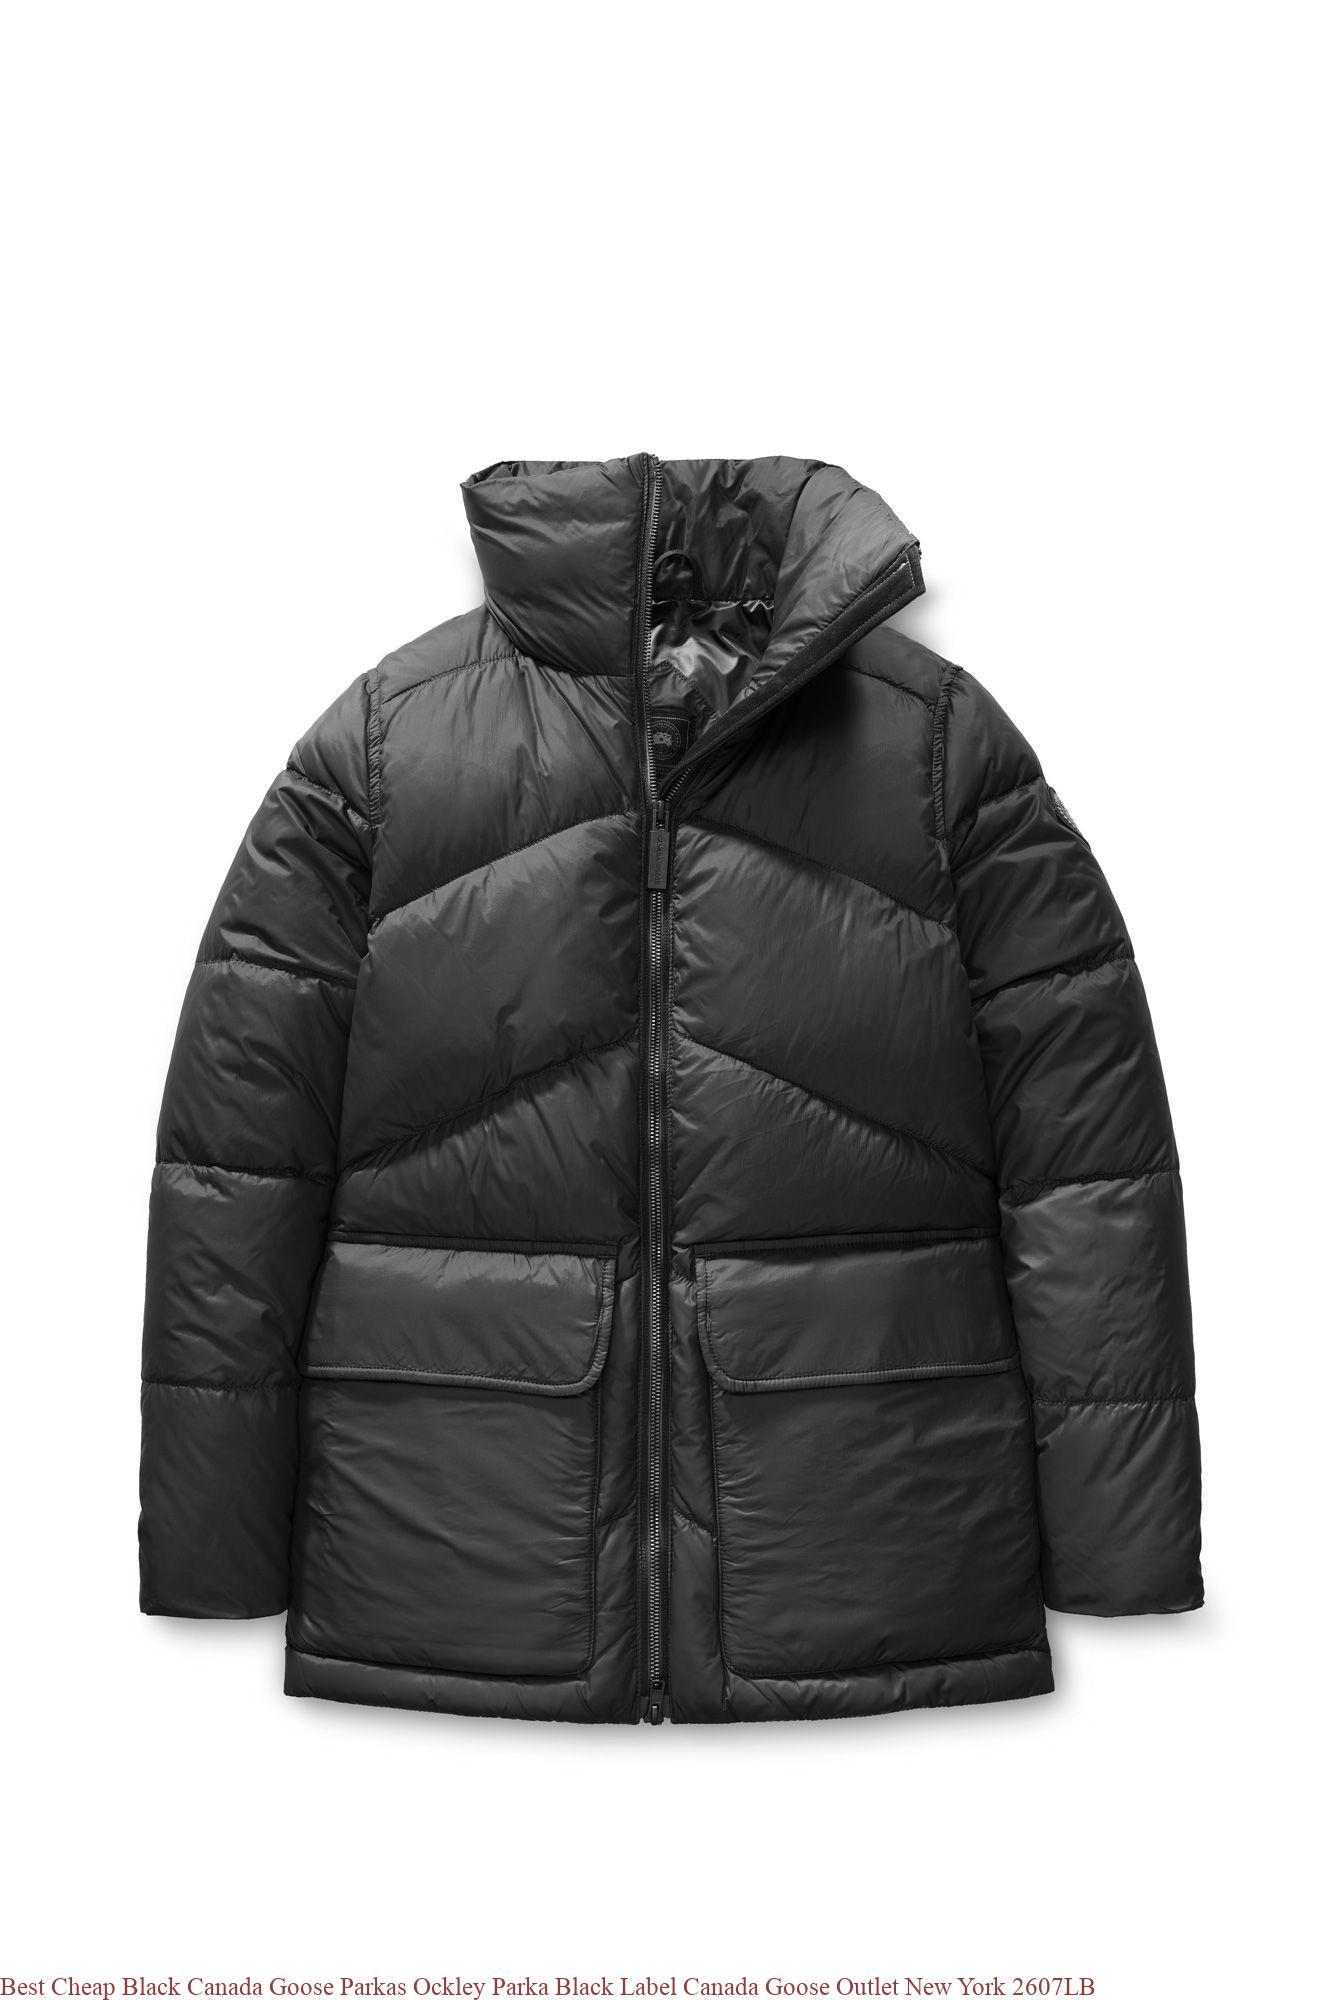 5d16b554b65 Best Cheap Black Canada Goose Parkas Ockley Parka Black Label Canada Goose  Outlet New York 2607LB